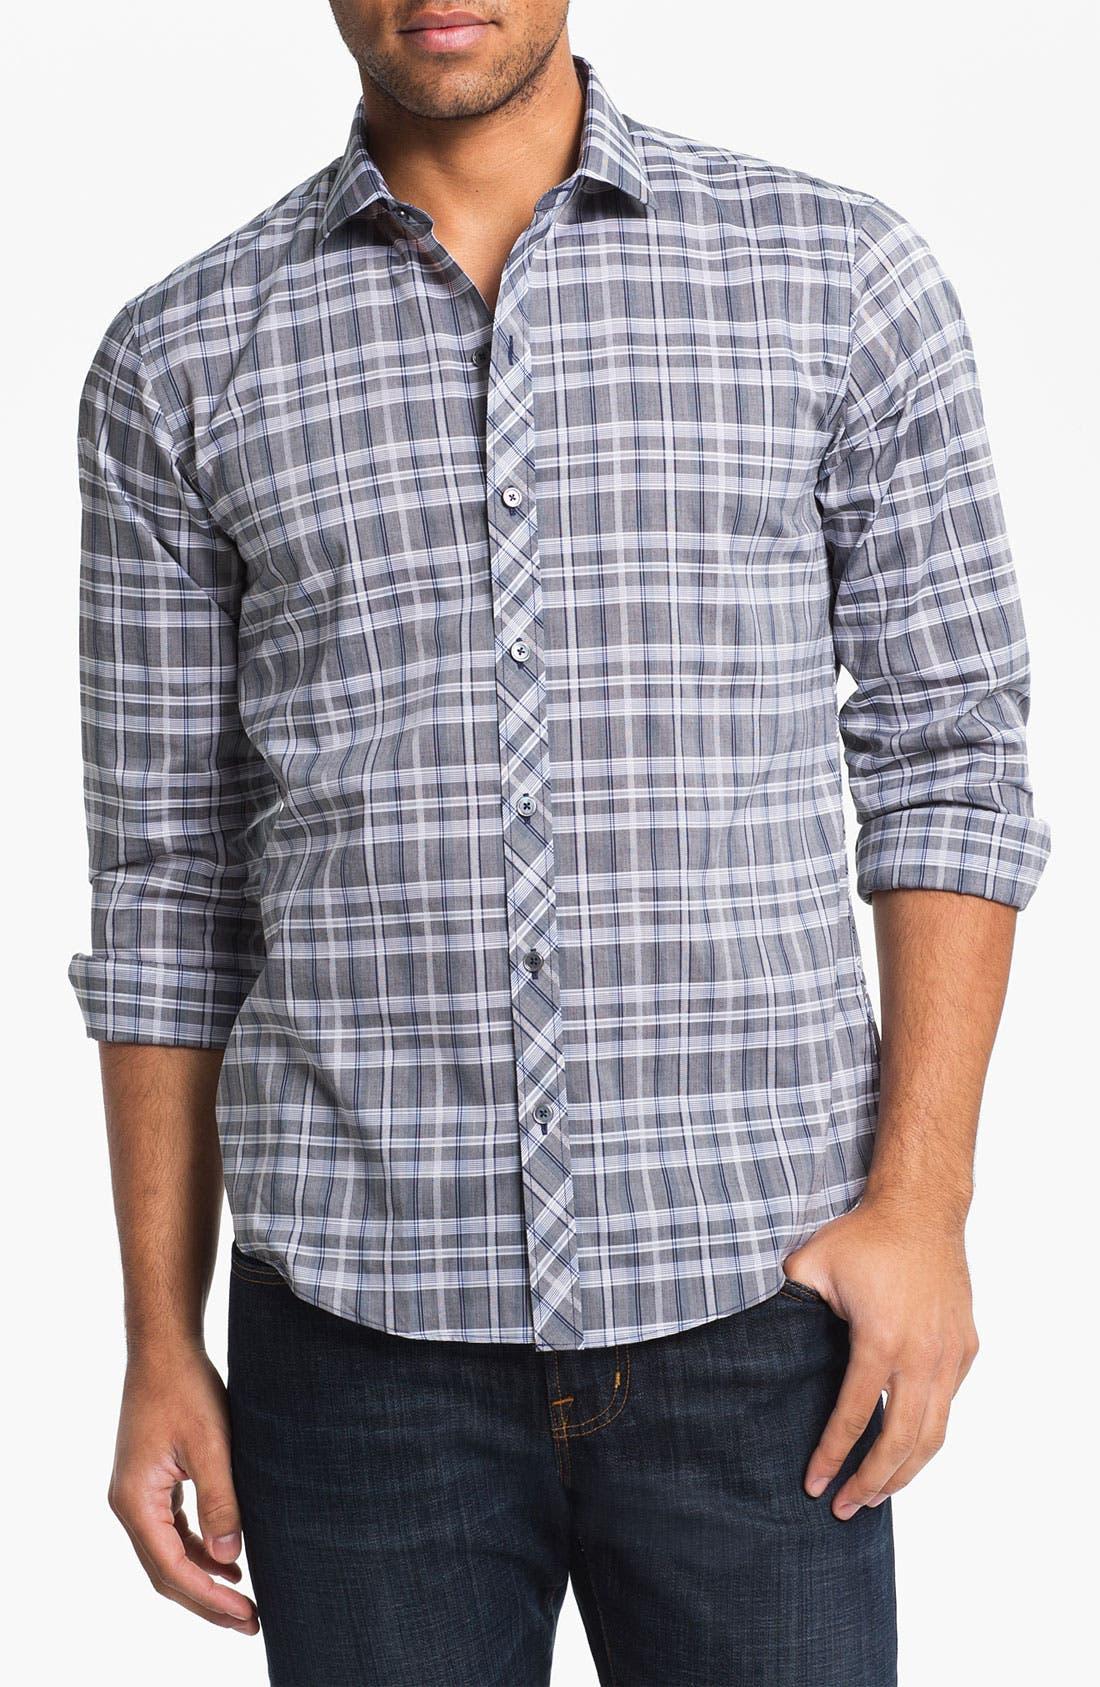 Alternate Image 1 Selected - Zachary Prell 'Kaiden' Sport Shirt